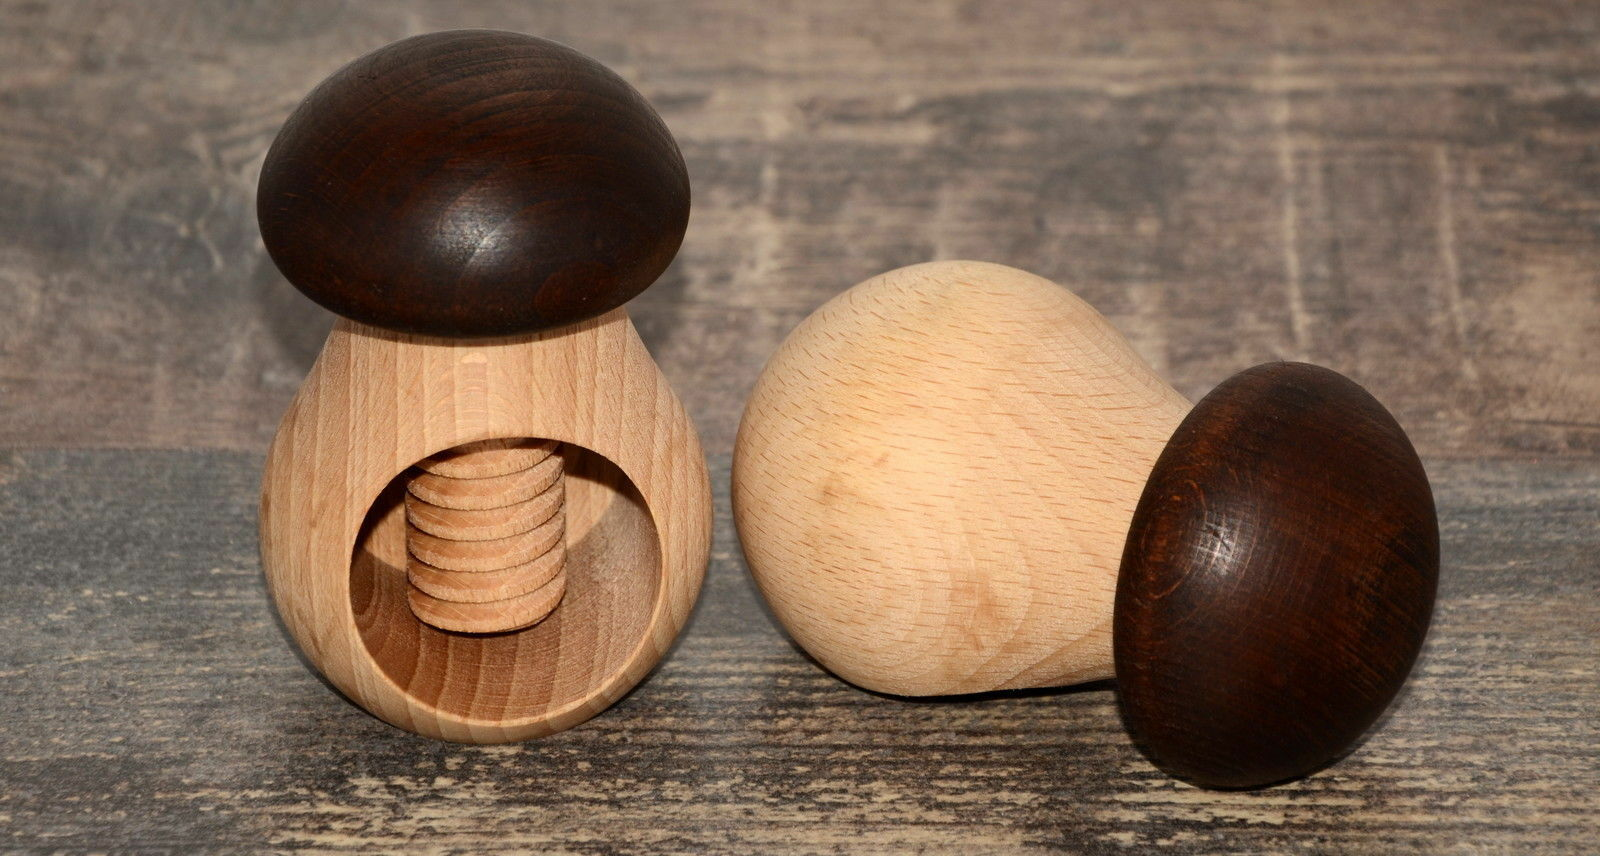 Nussknacker Pilz schön aus Holz Nussbrecher Pilzform Steinpilz Nussschraube